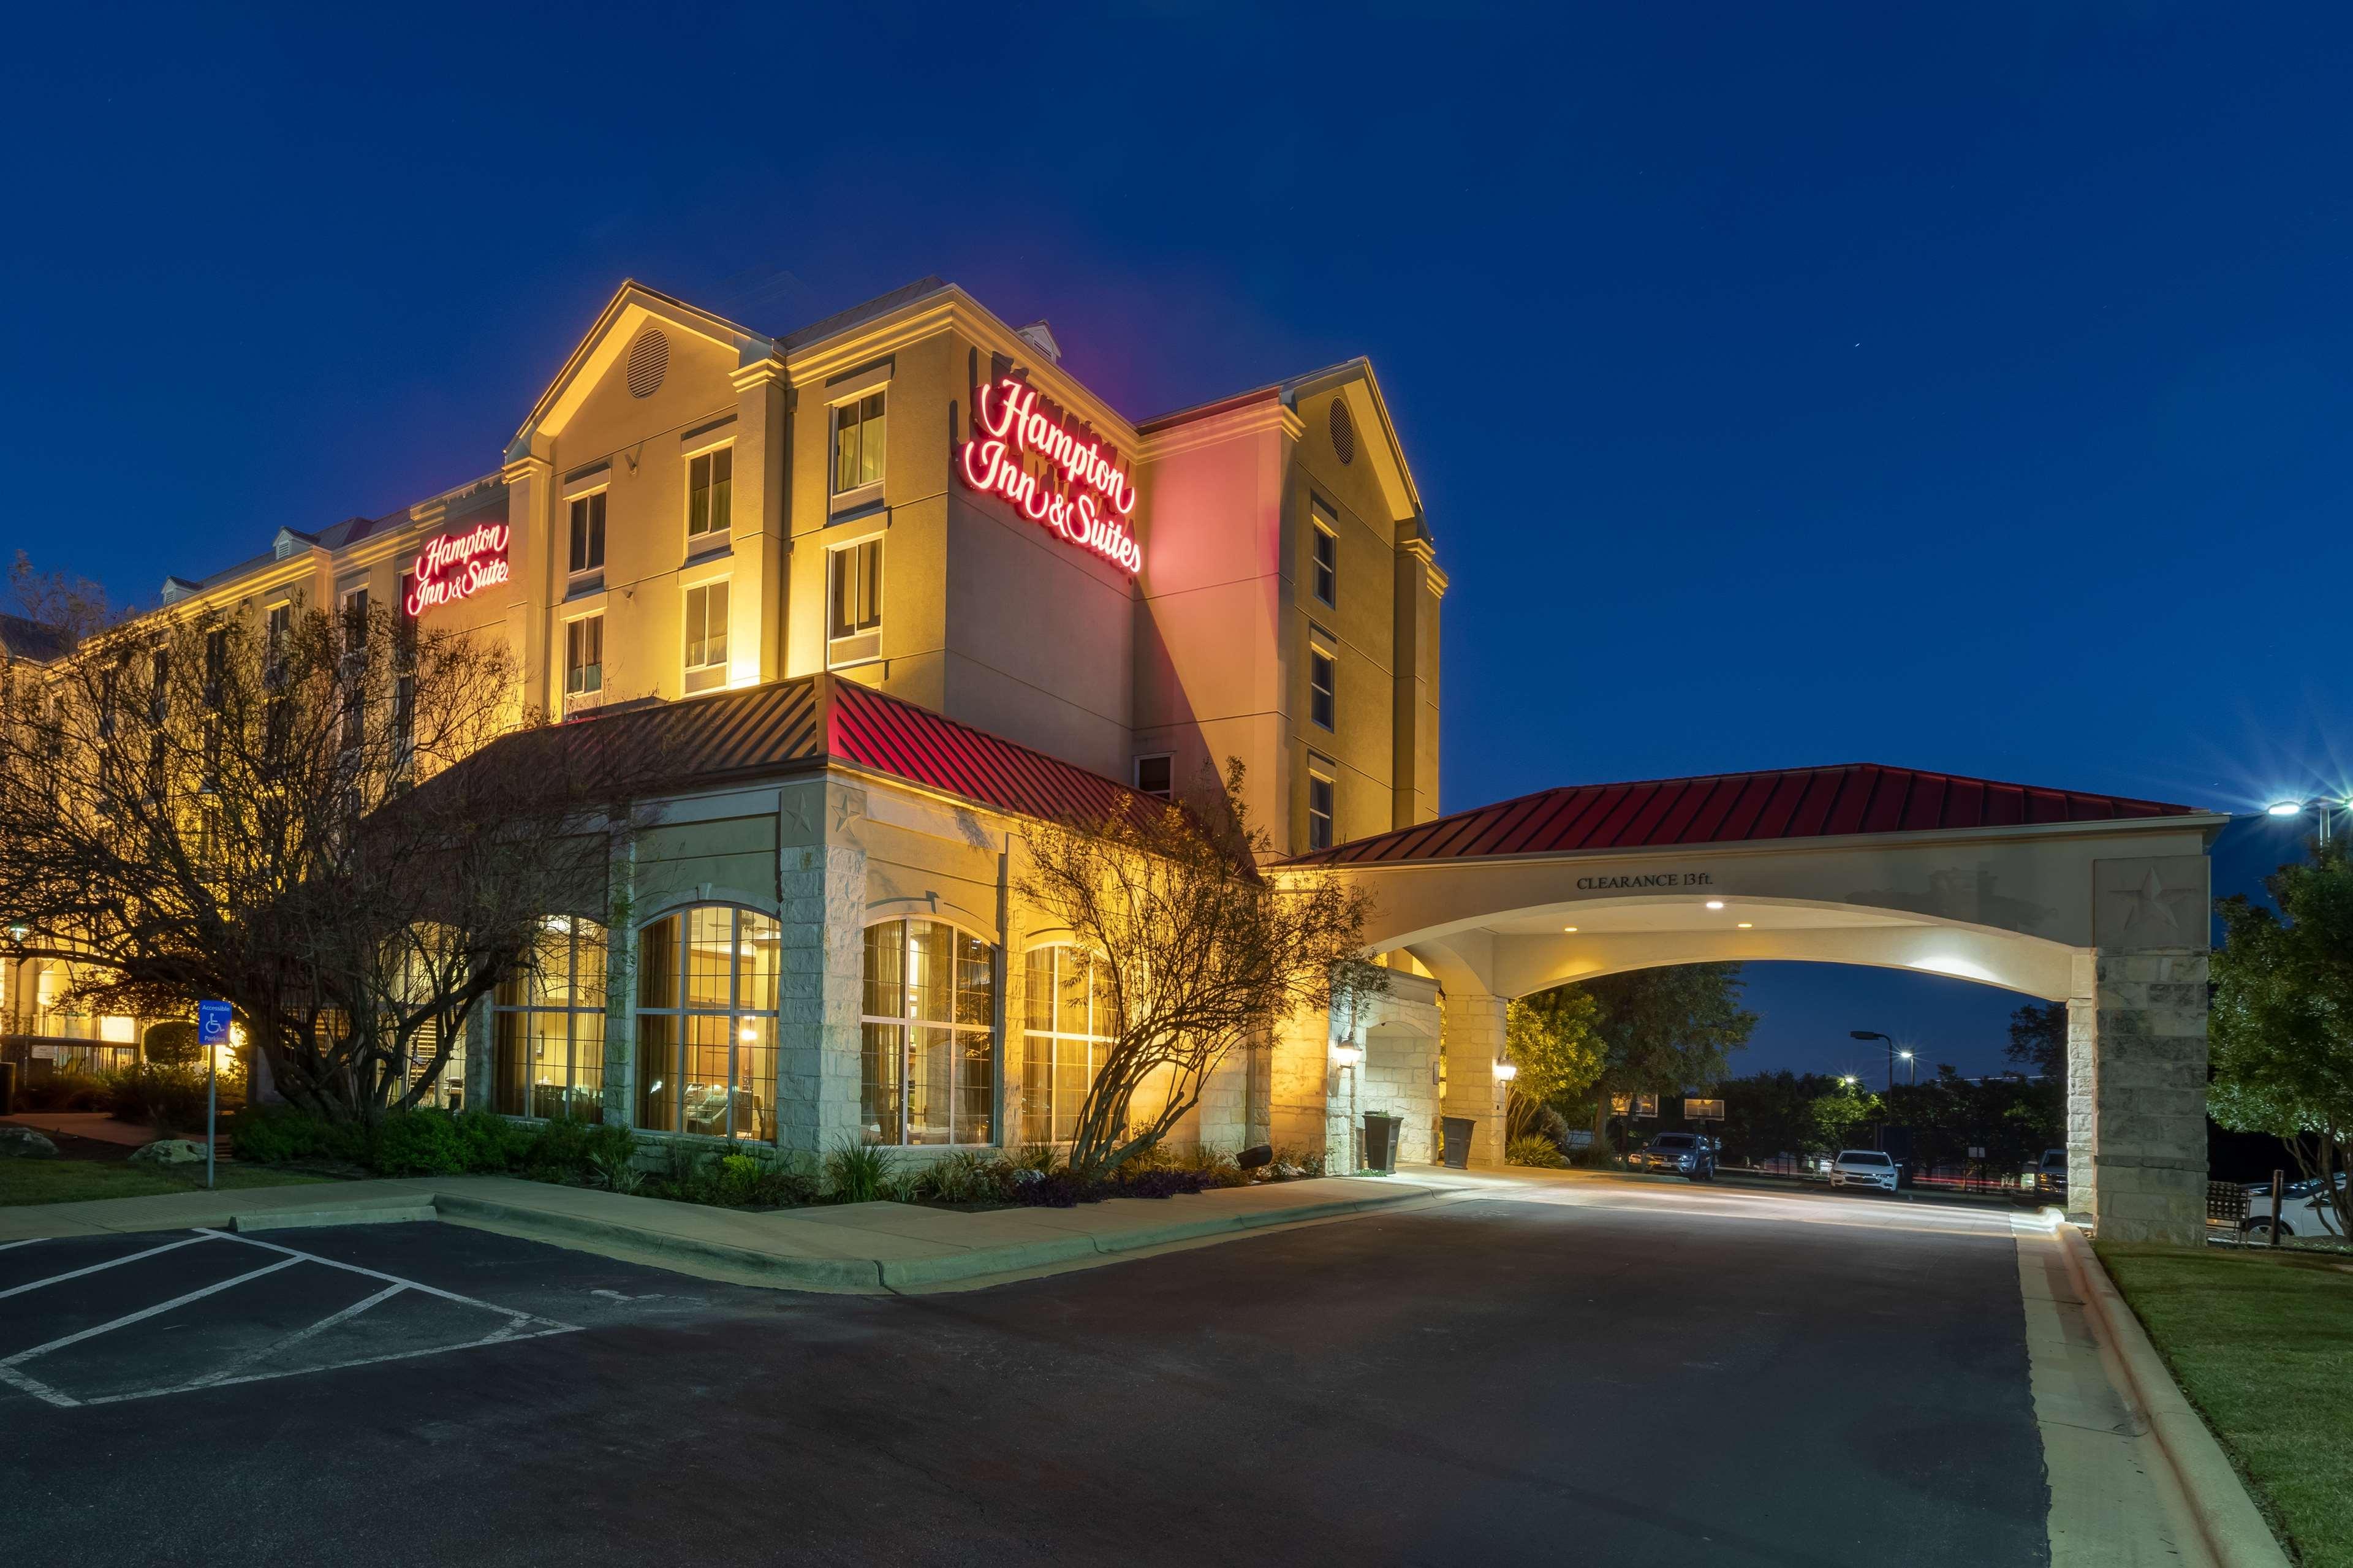 Hampton Inn & Suites Austin-Airport image 1